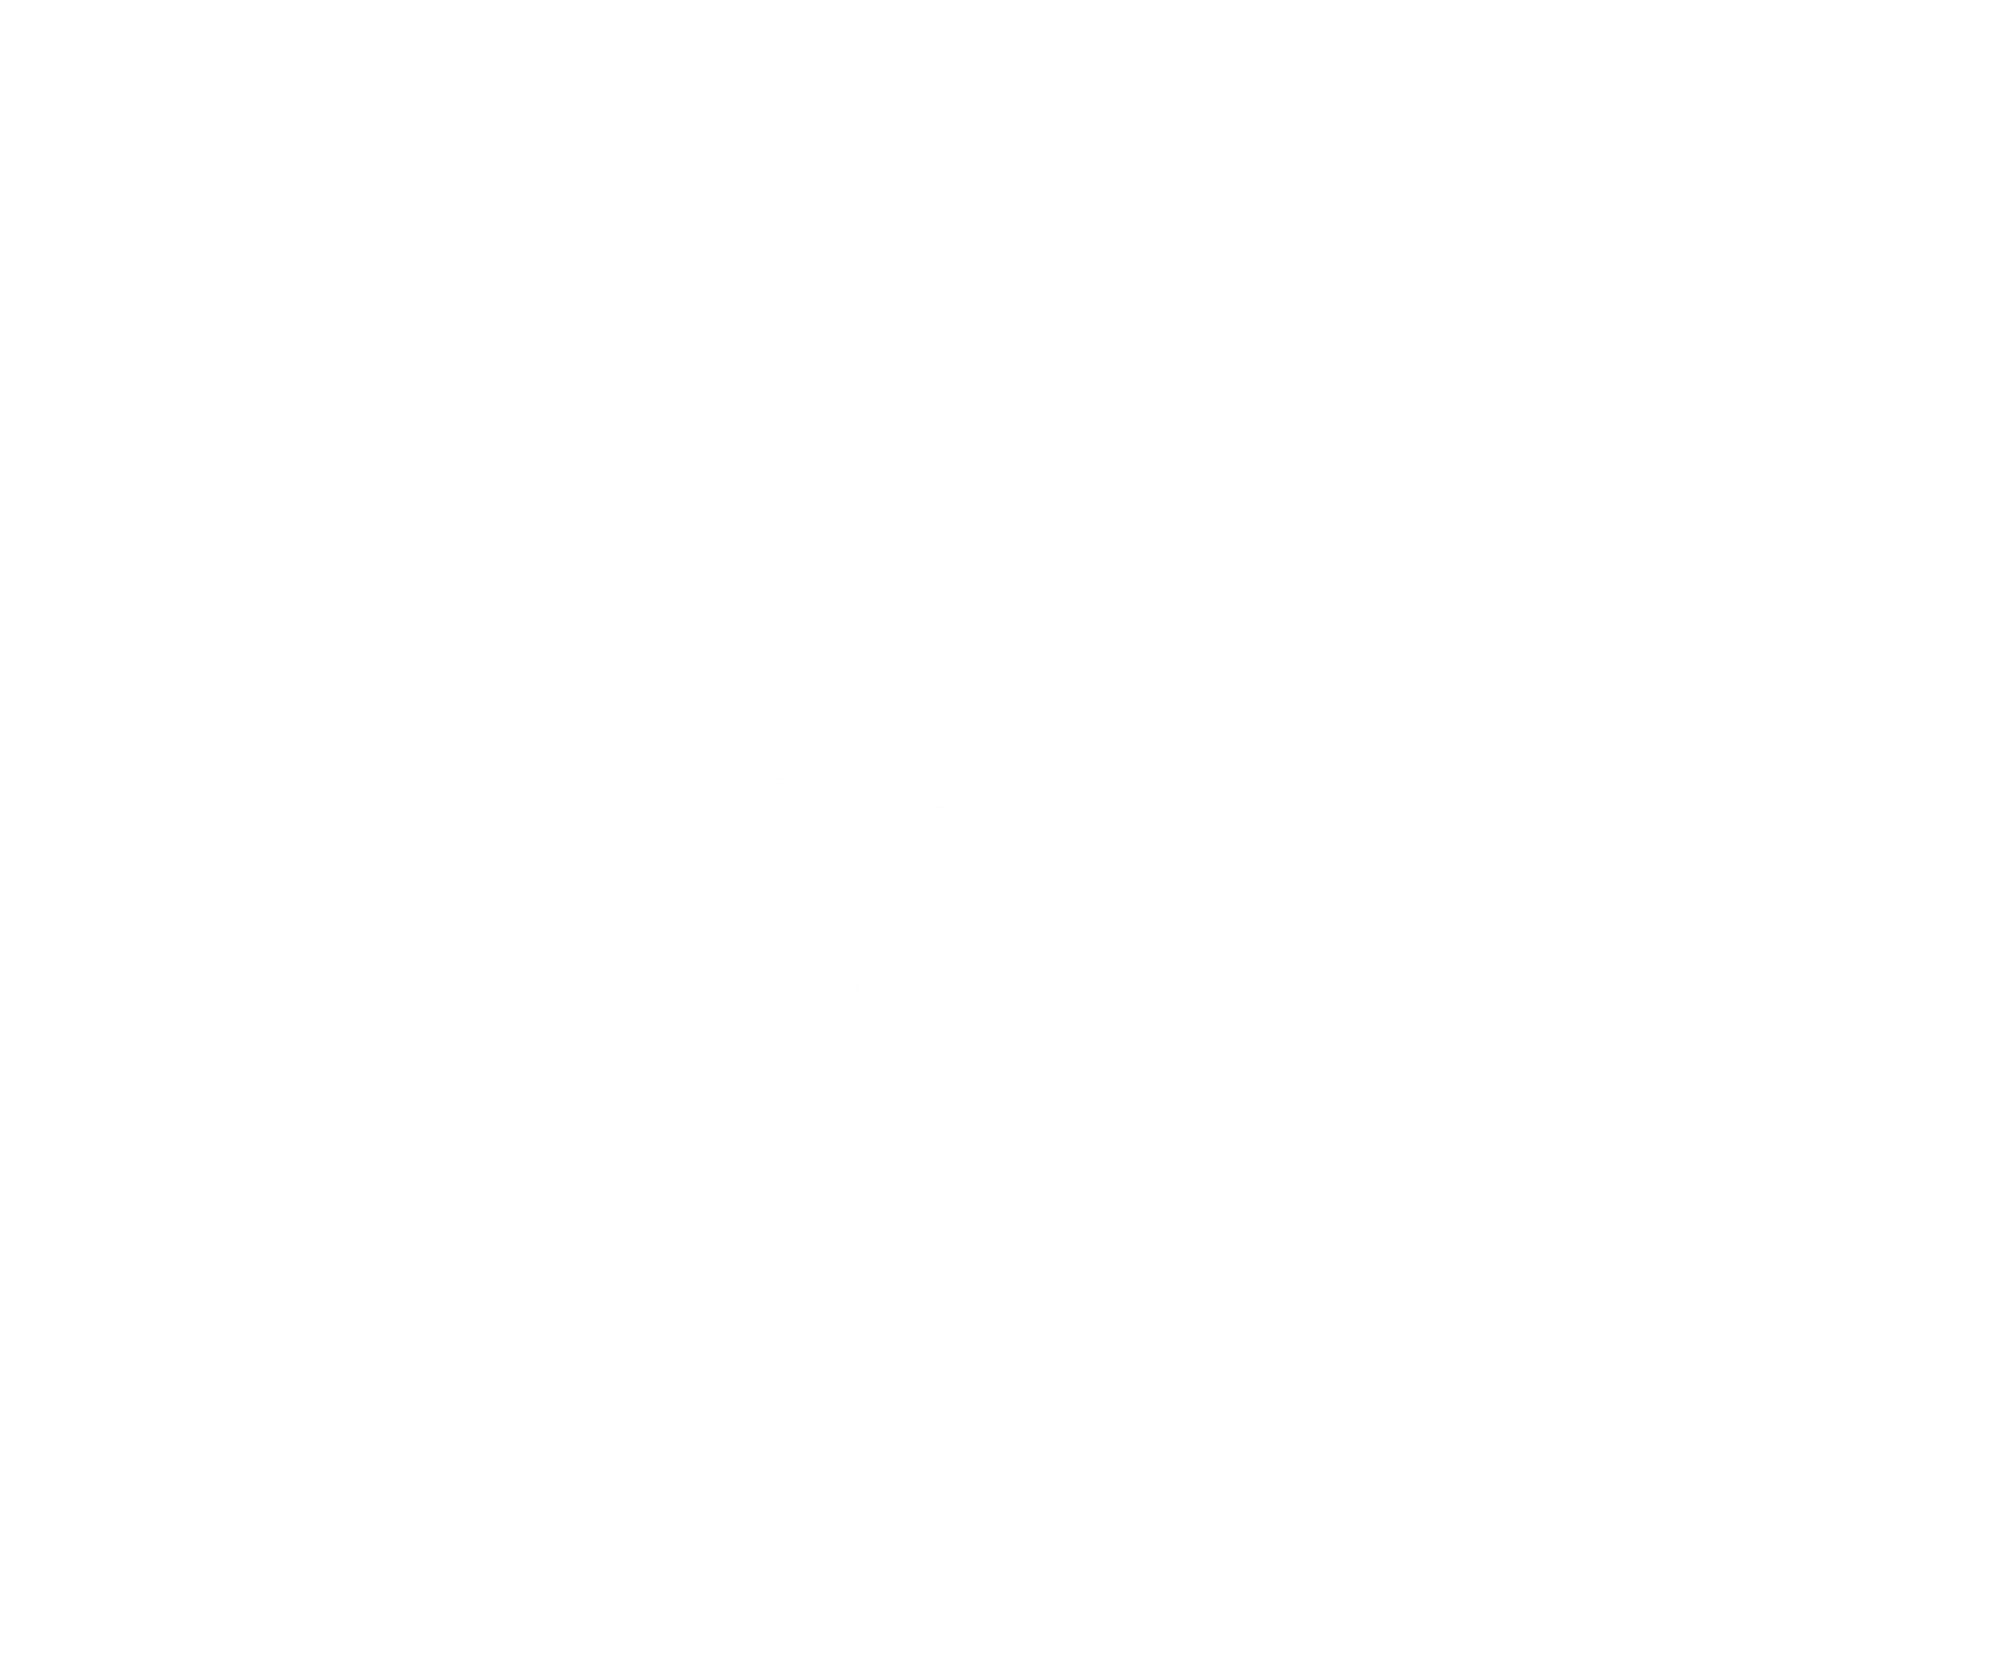 Global Hybrid (bem)(white) copie.png